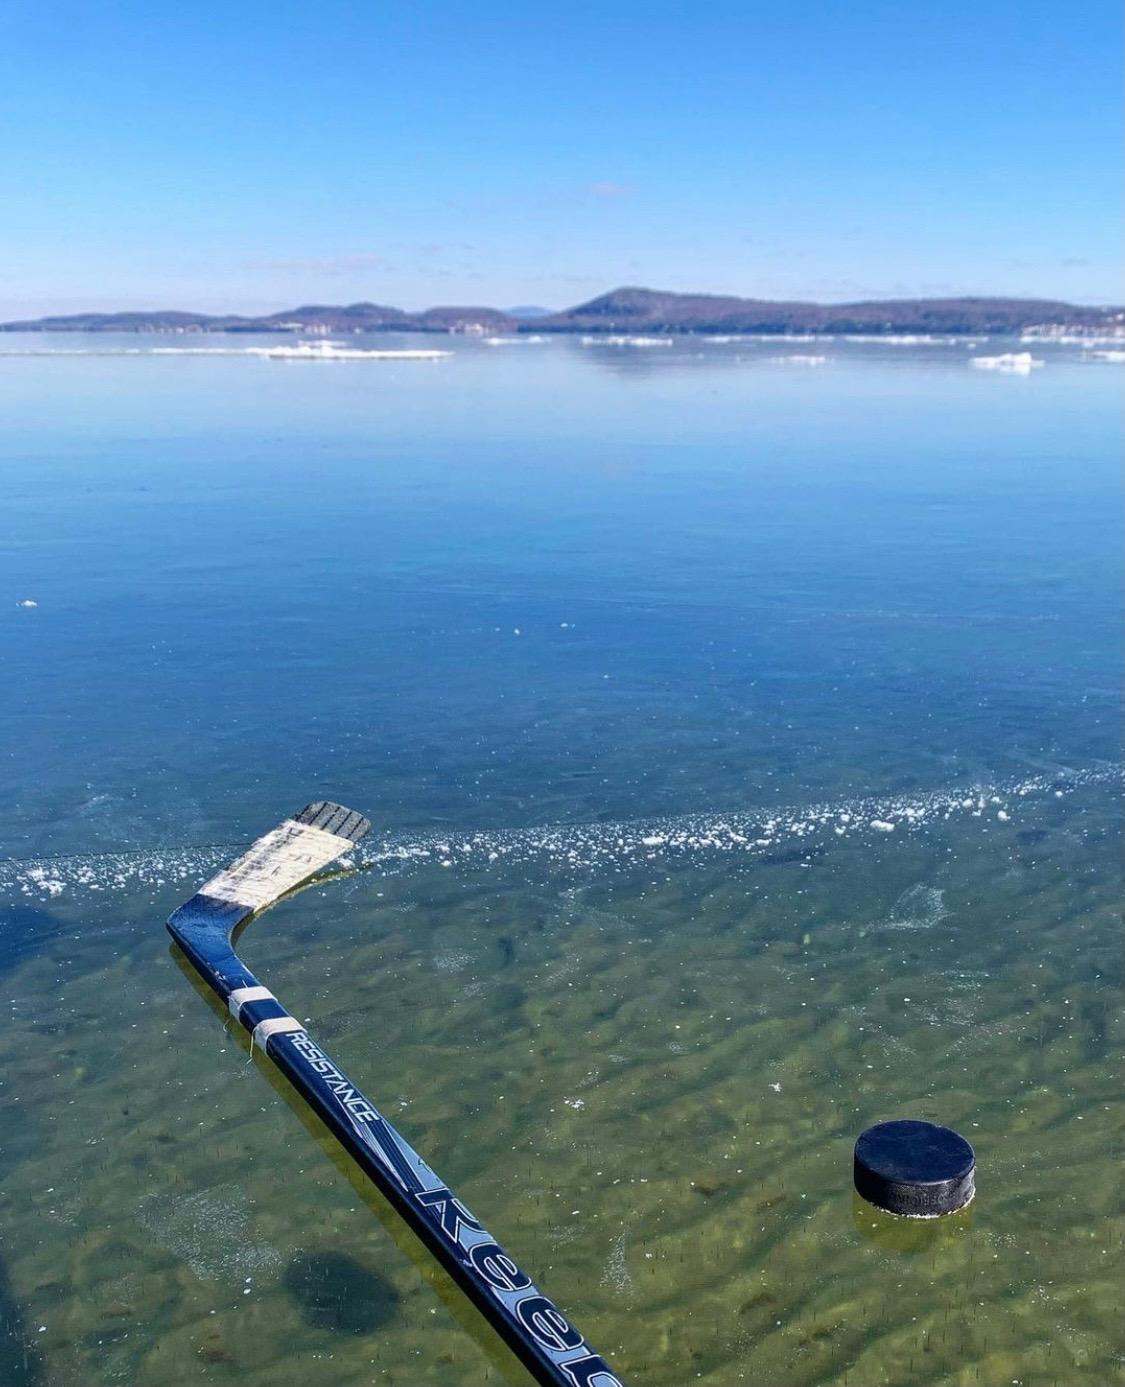 lake hockey on frozen lake near sandbar causeway